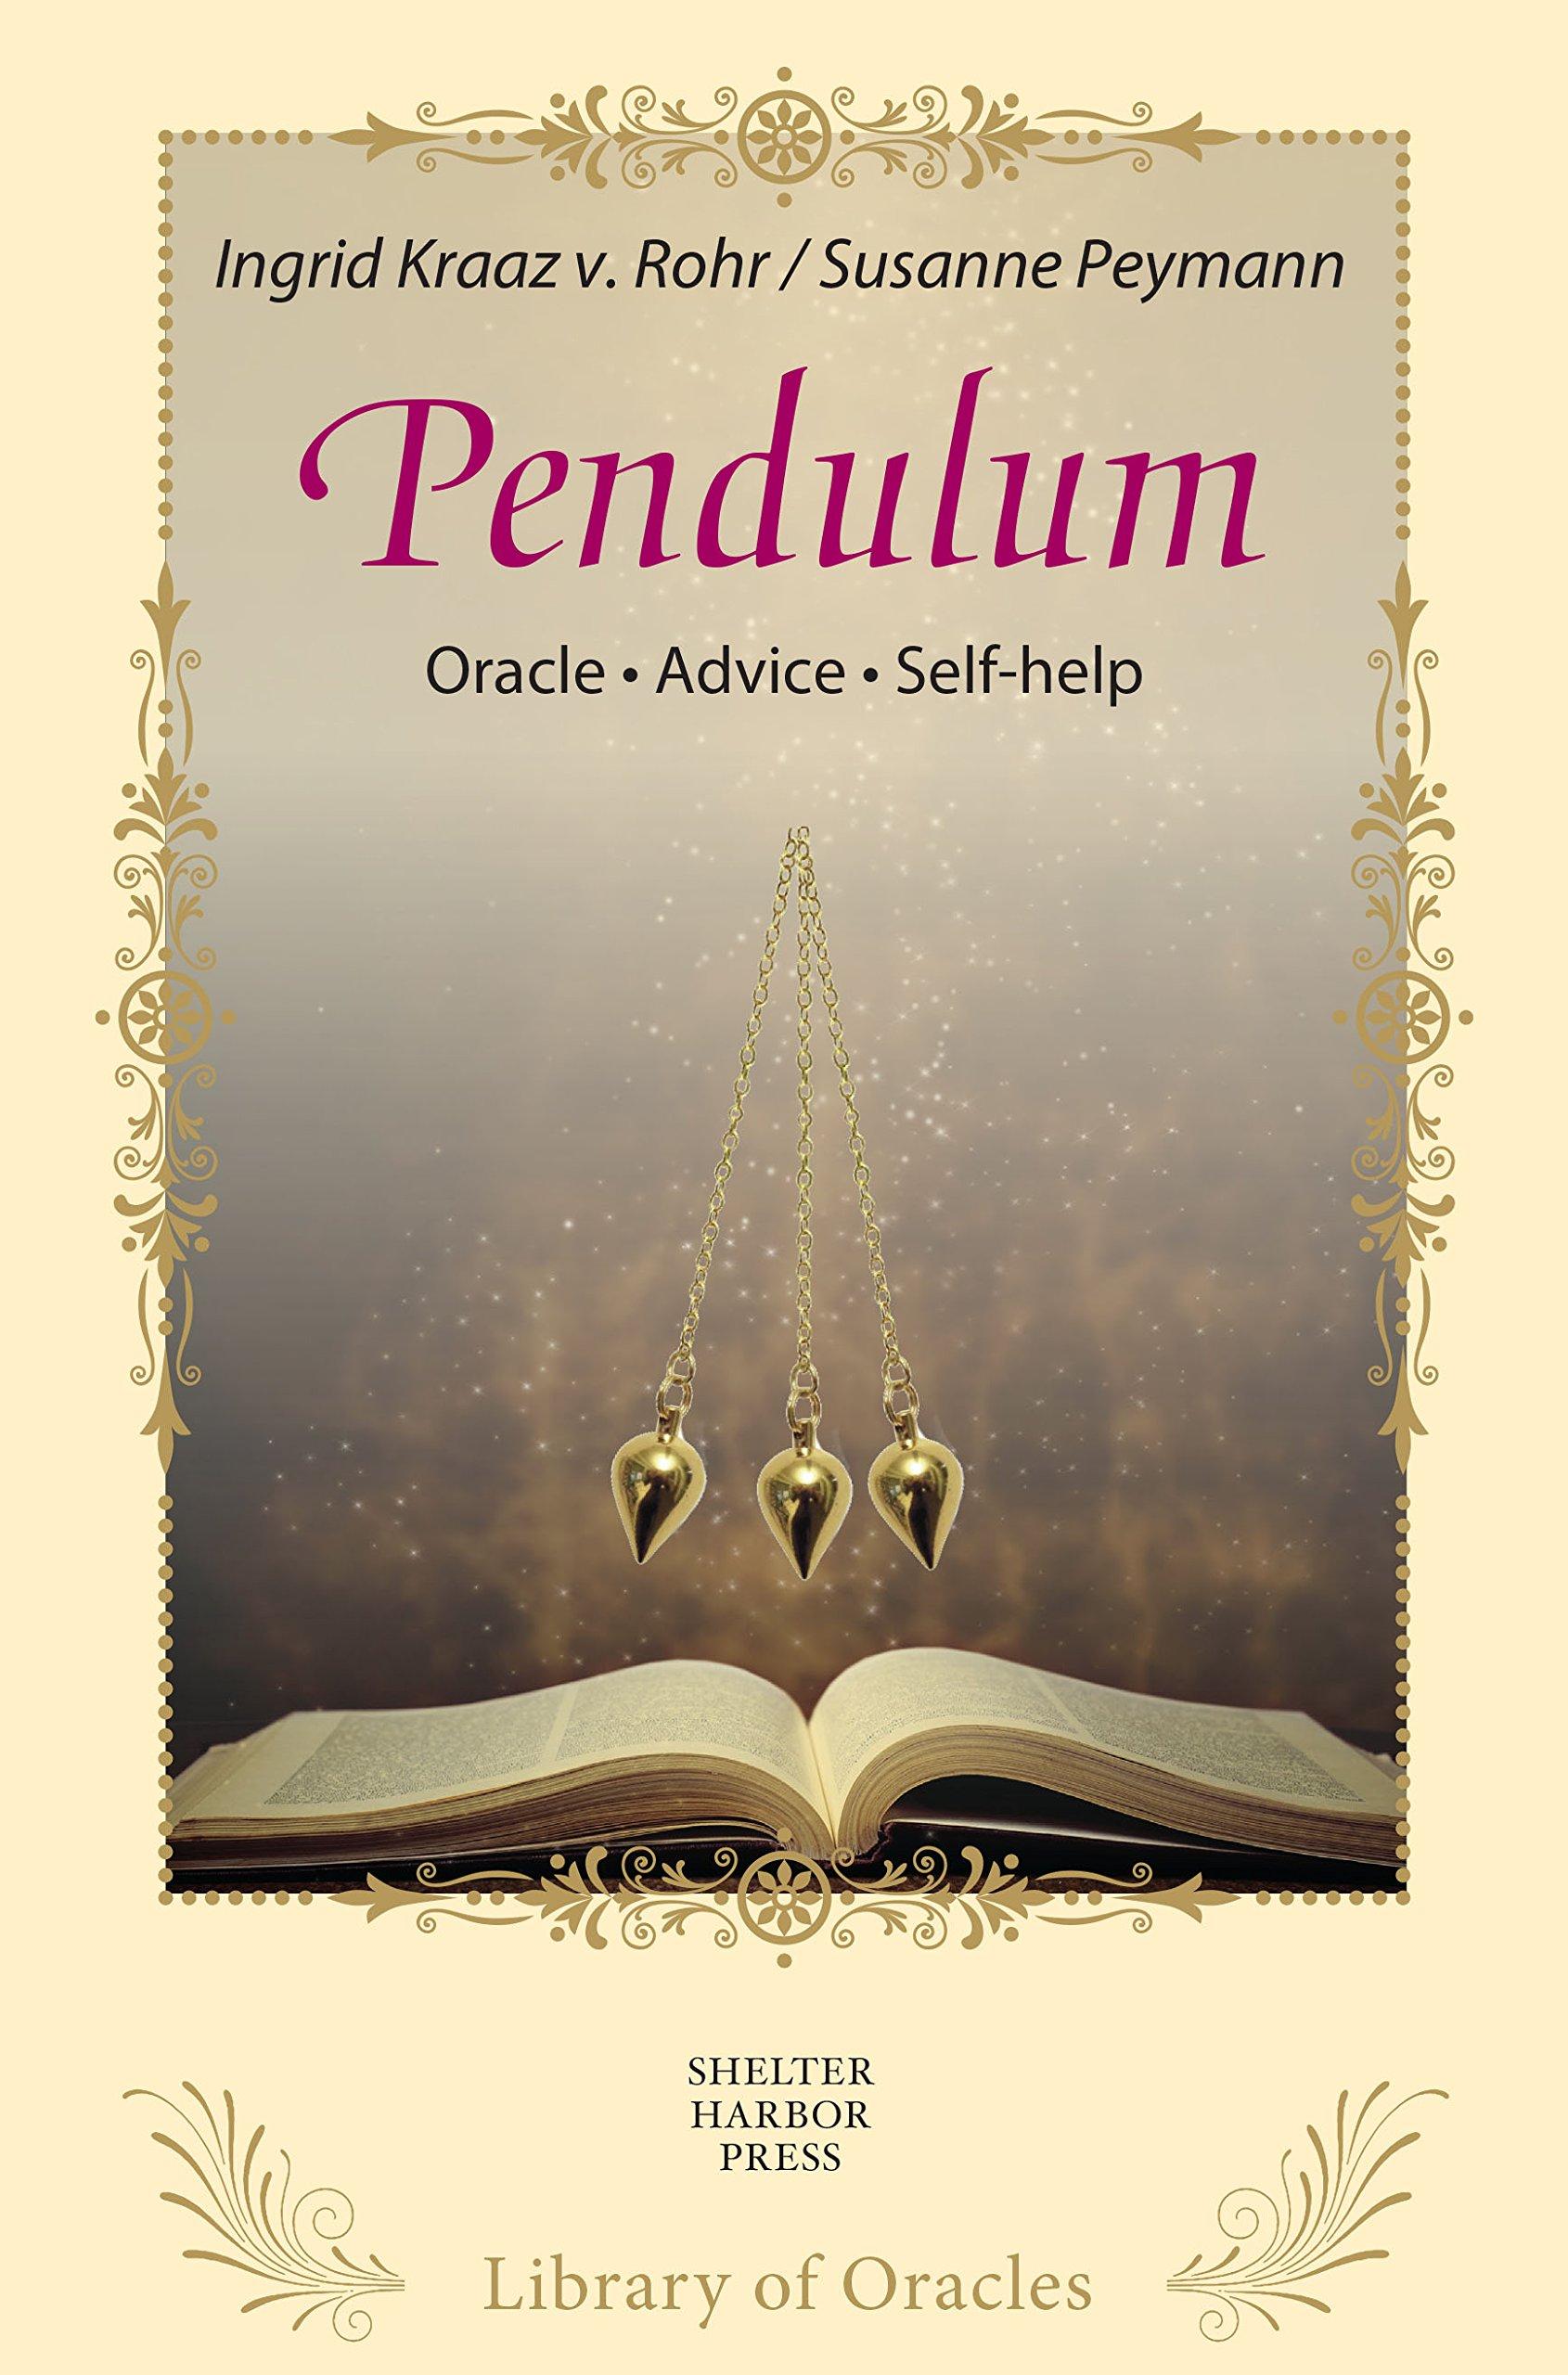 Pendulum- The Magic Pendulum Library of Oracles  ebook by Susanne Peymann